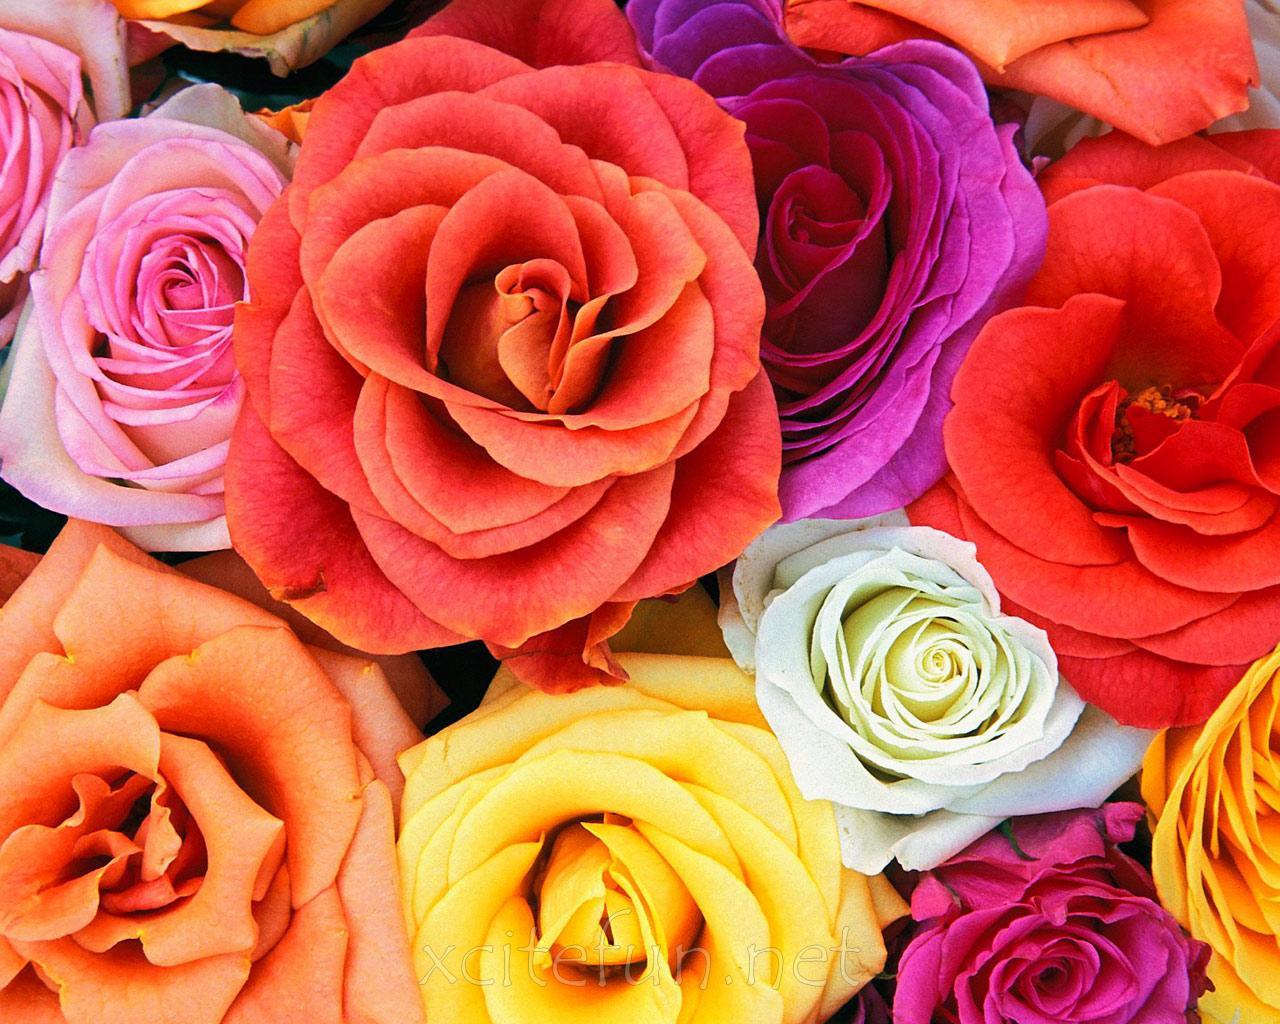 100 Most Beautiful Flower Wallpapers Flowers Healthy